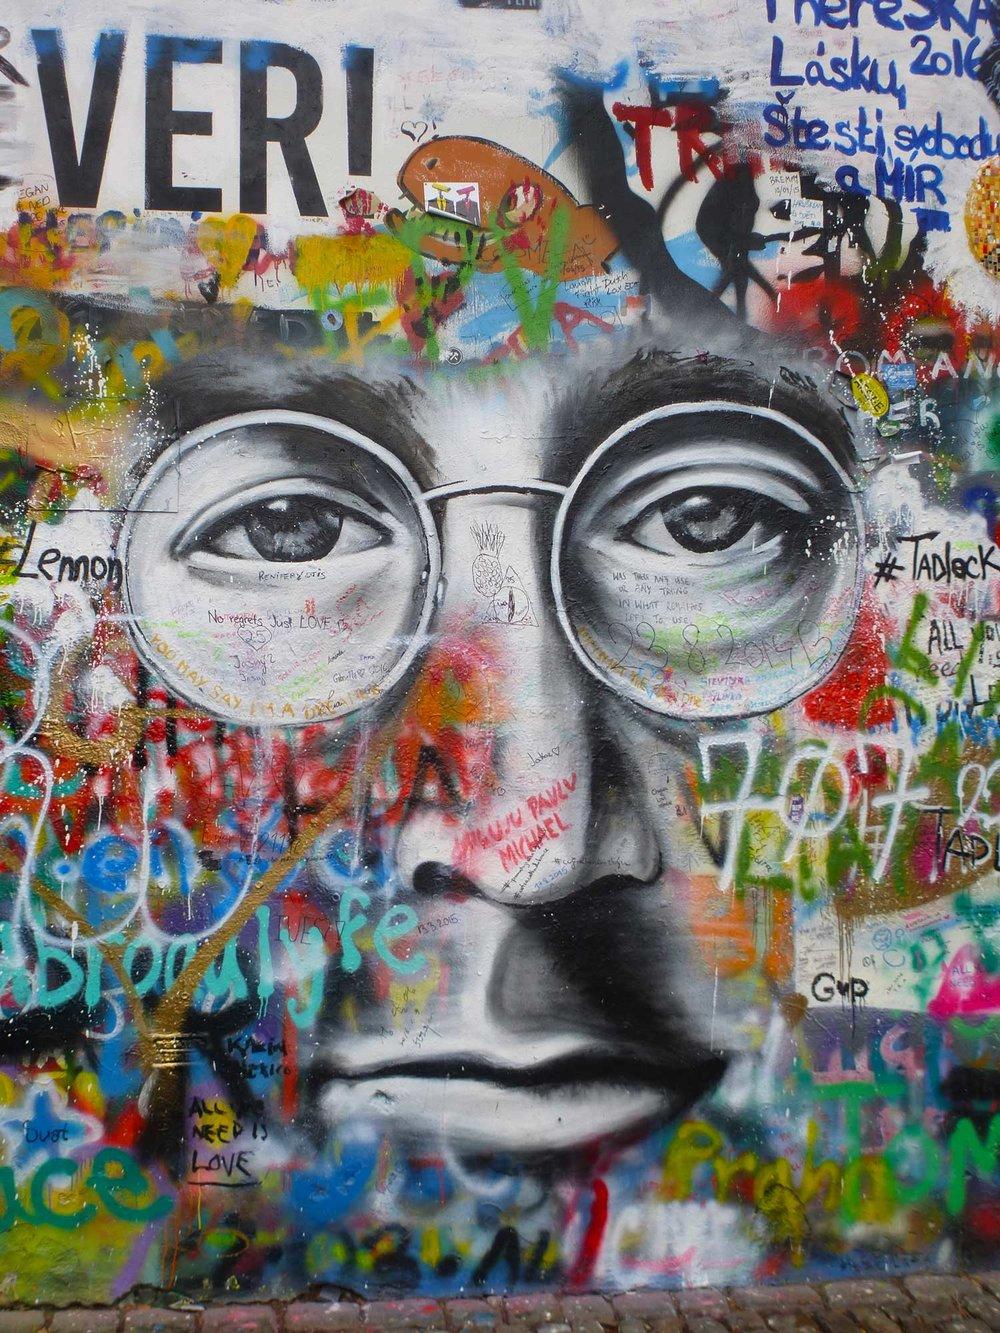 John-Lennon-Wall.jpg